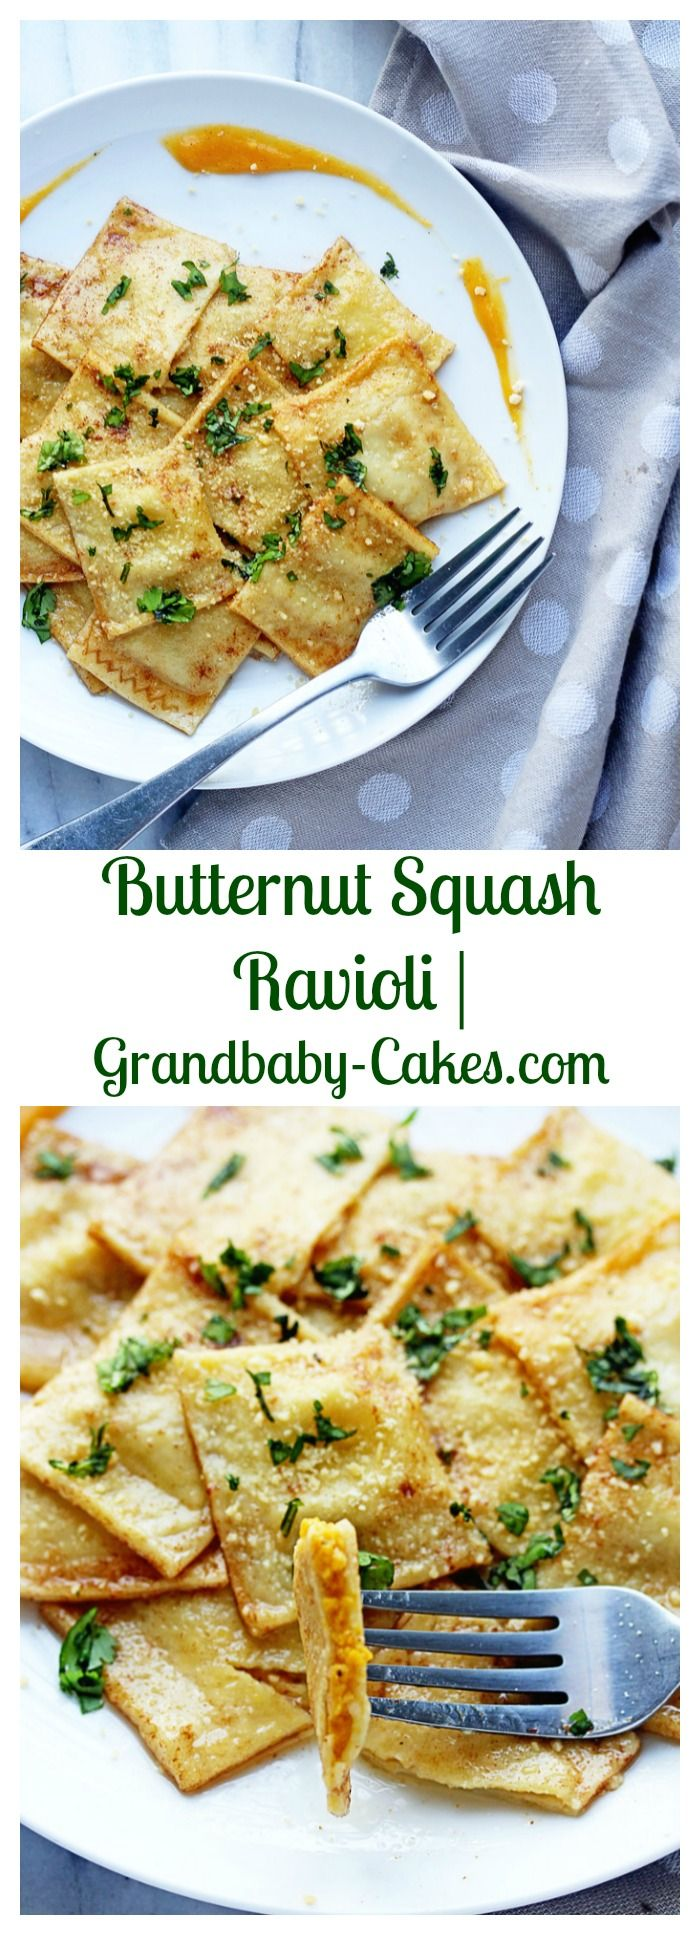 Butternut Squash Ravioli | Grandbaby-Cakes.com